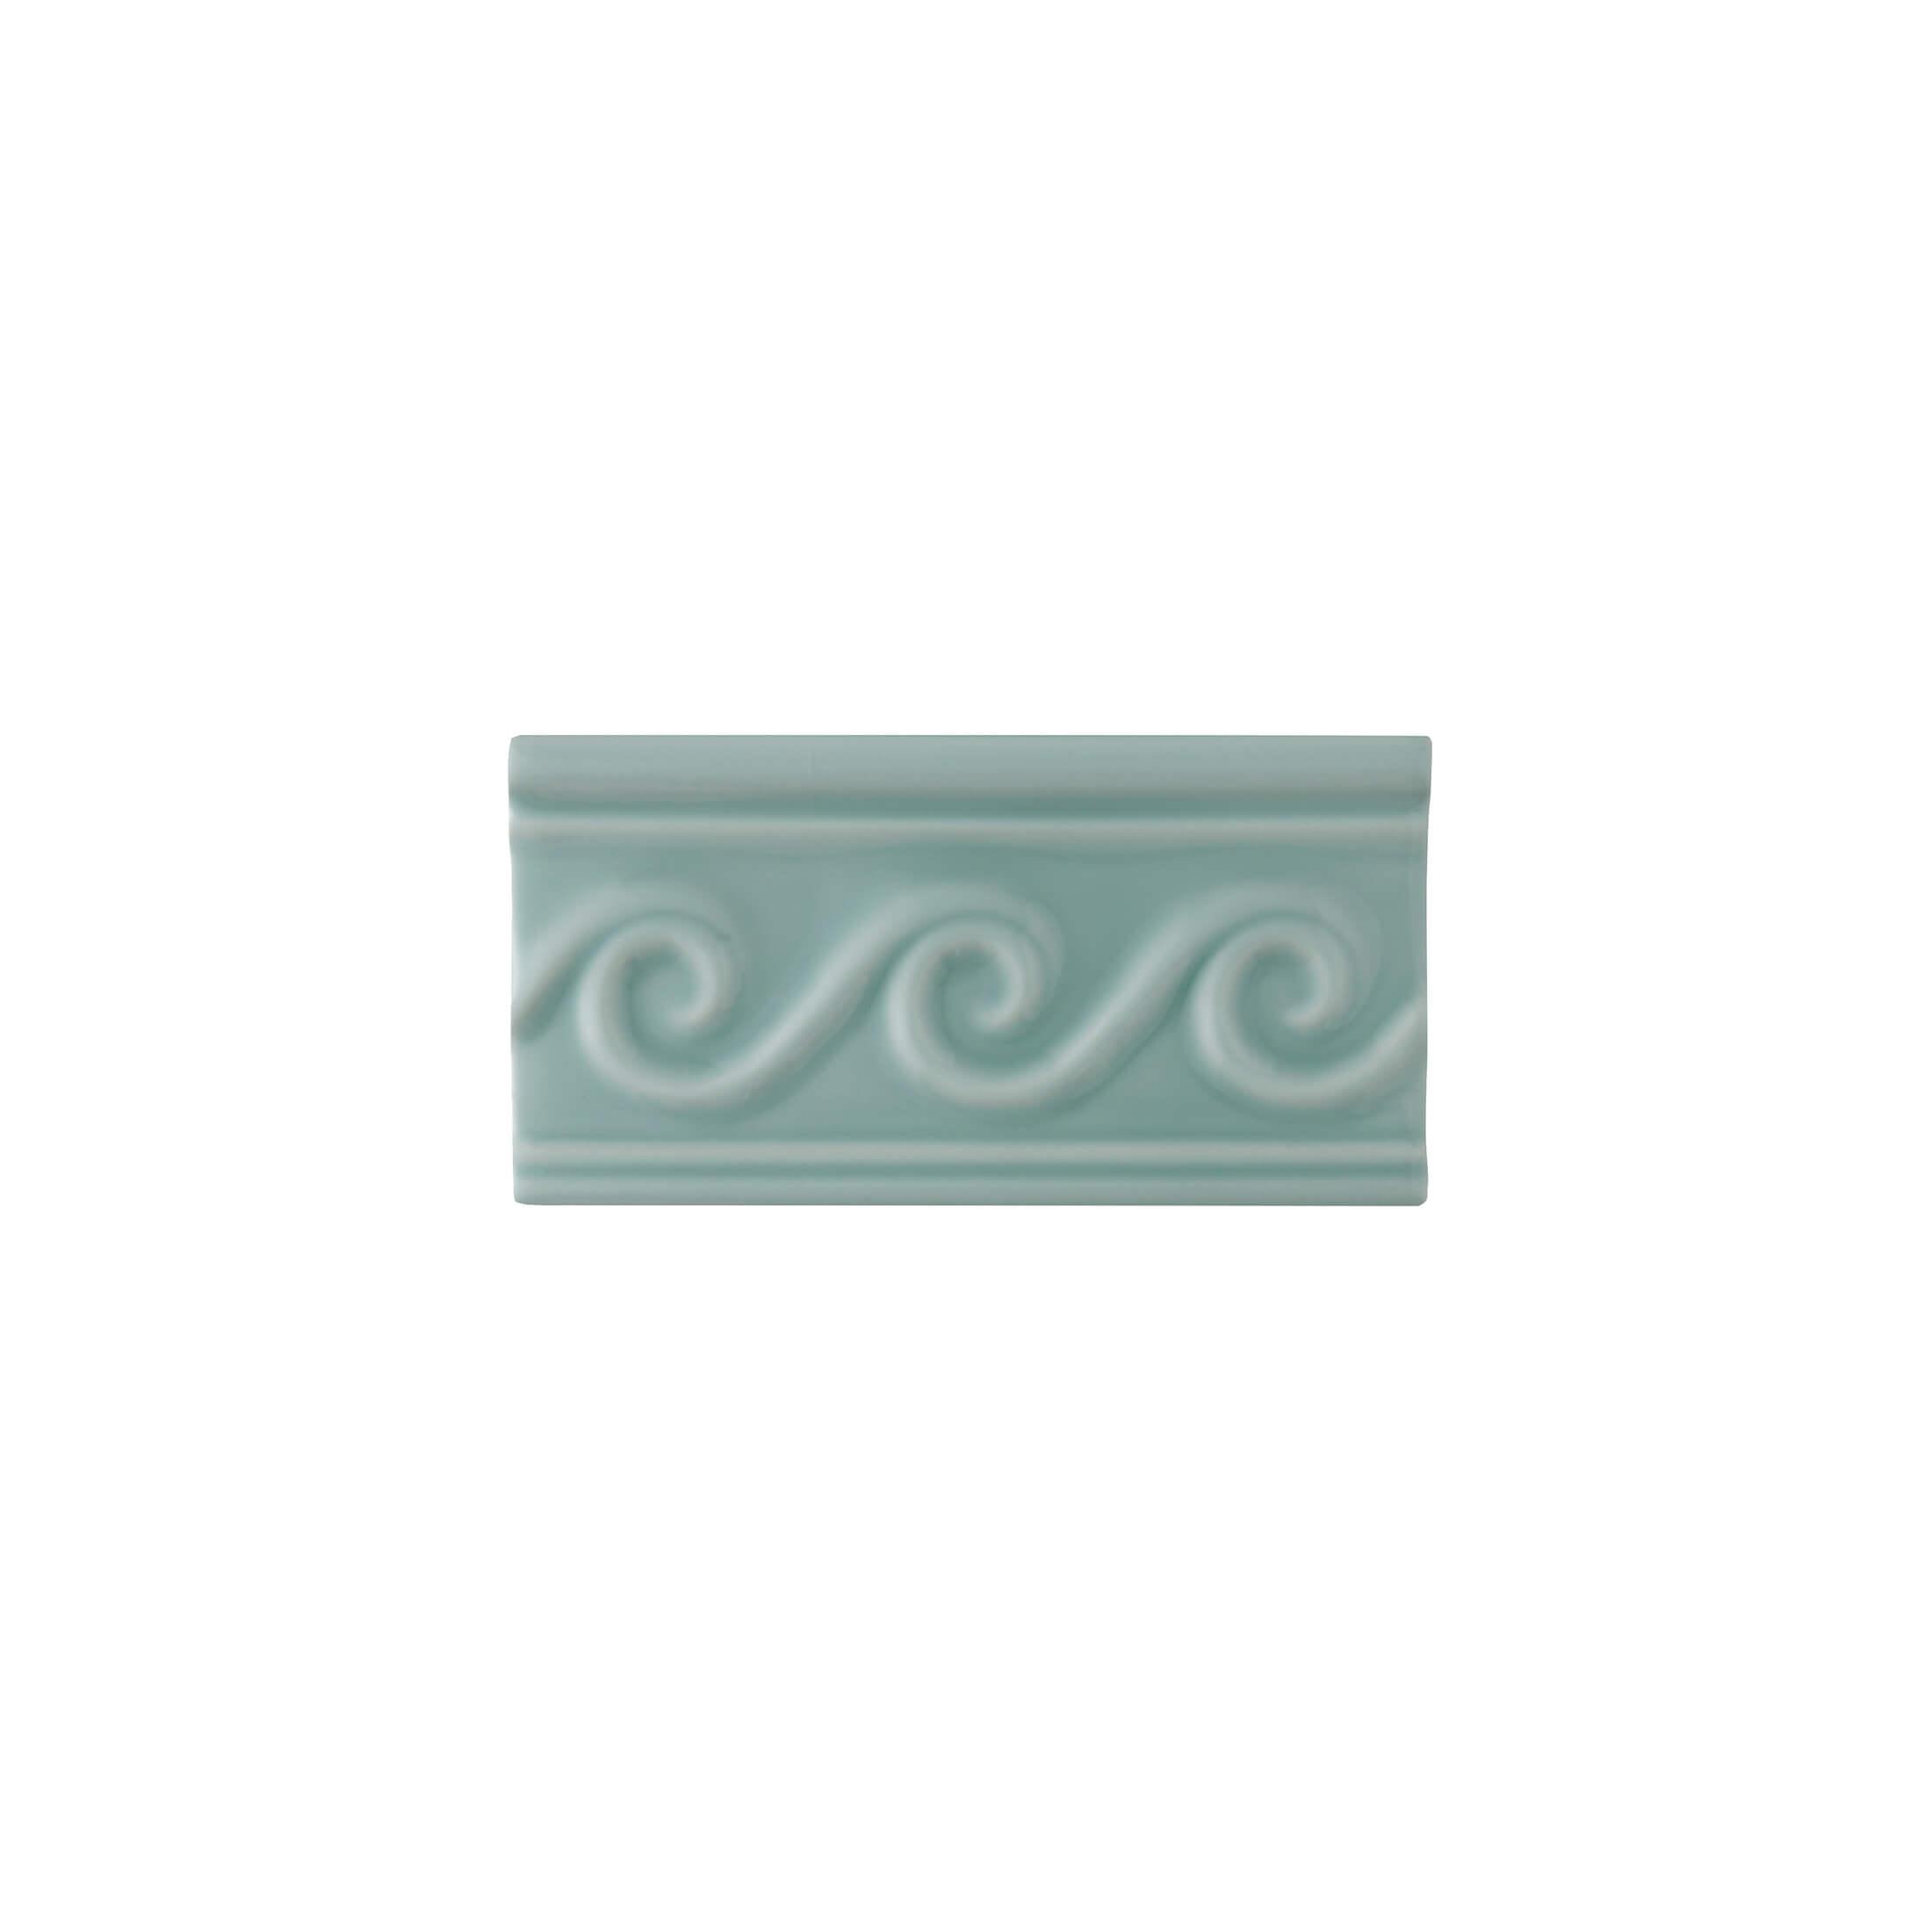 ADNE4145 - RELIEVE OLAS PB - 7.5 cm X 15 cm